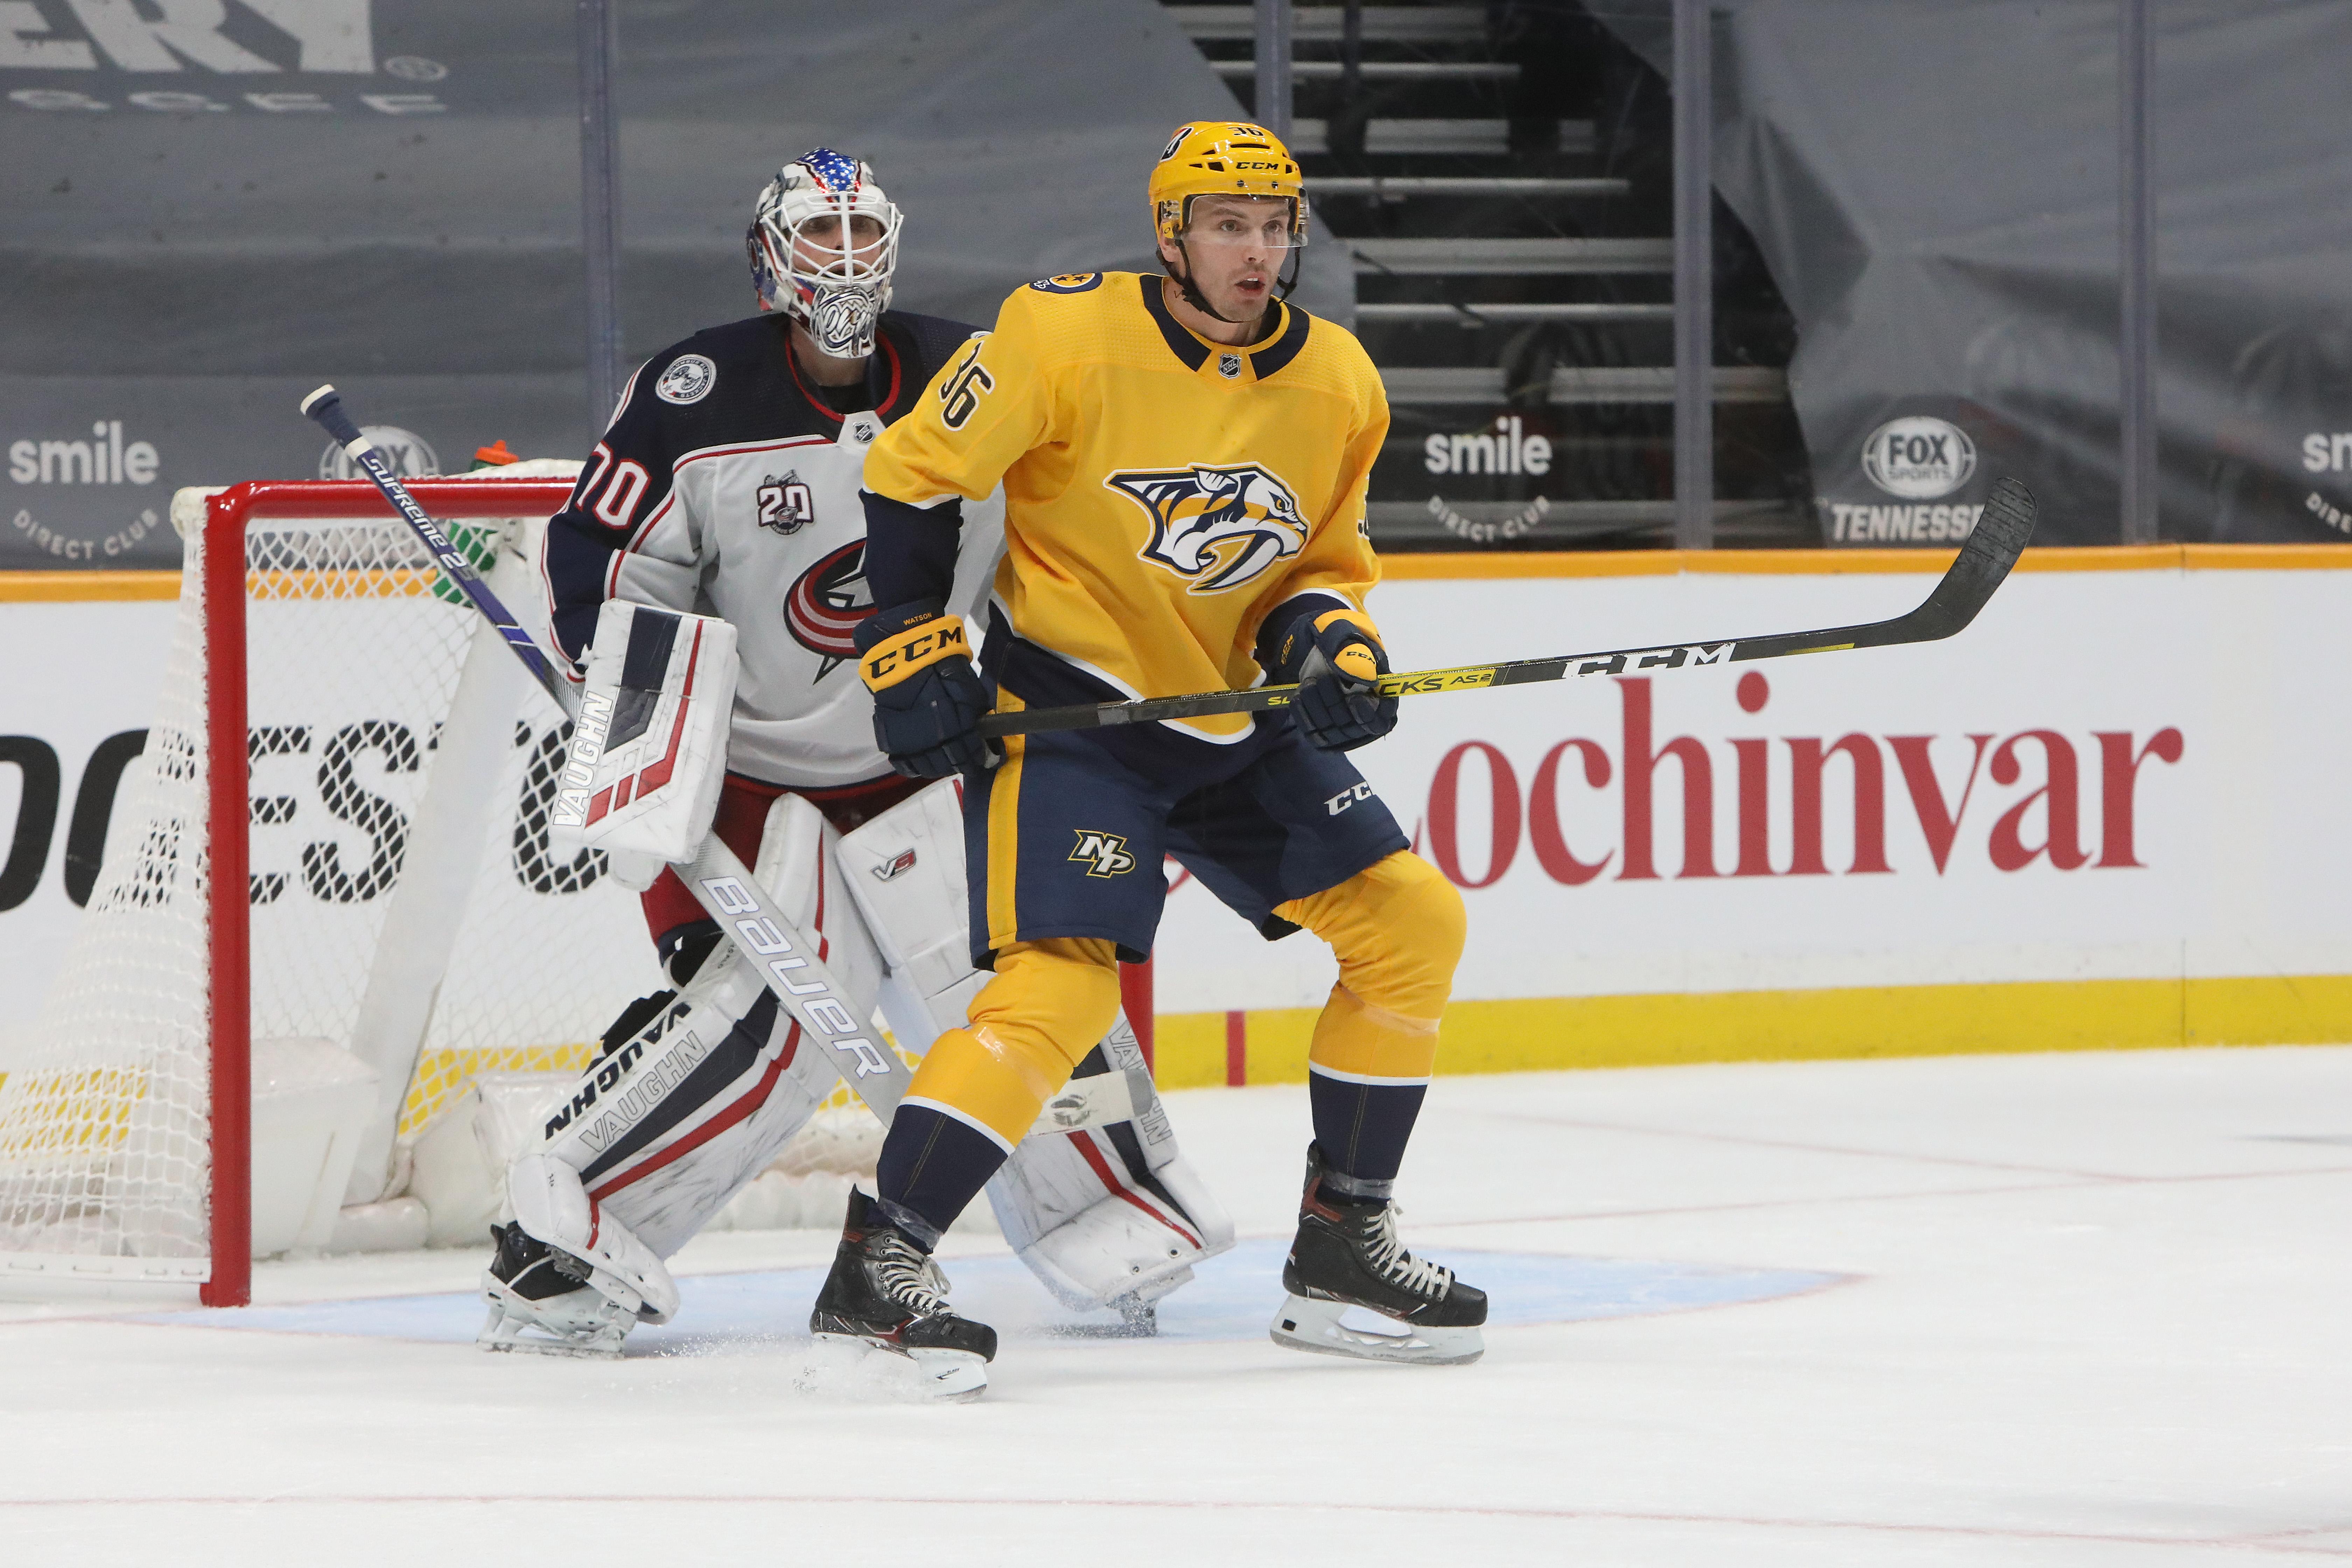 NHL: JAN 14 Blue Jackets at Predators